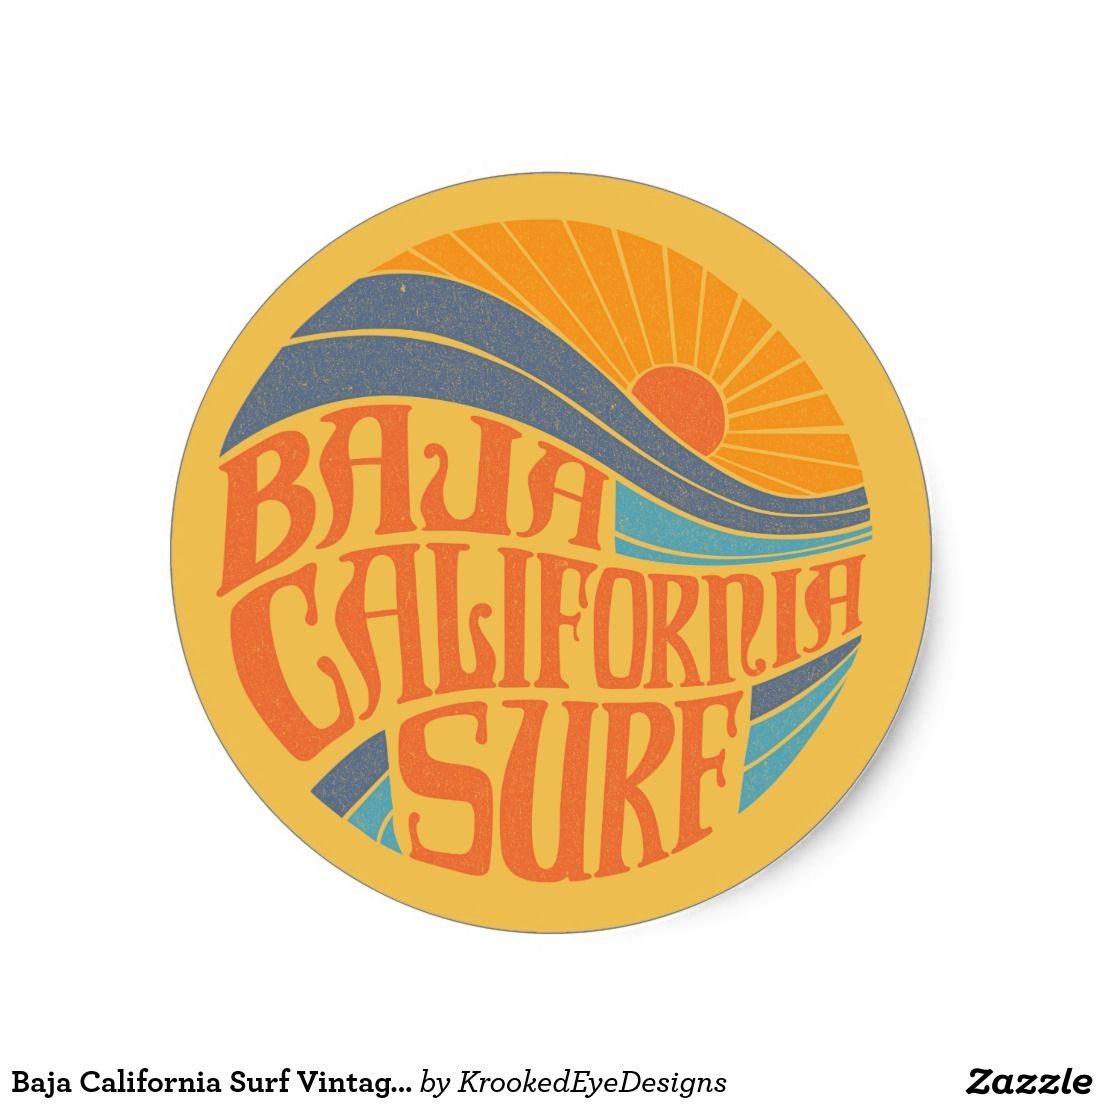 Baja California Surf Vintage Sticker Zazzle Com Surf Stickers Retro Surf Surf Logo [ 1104 x 1104 Pixel ]